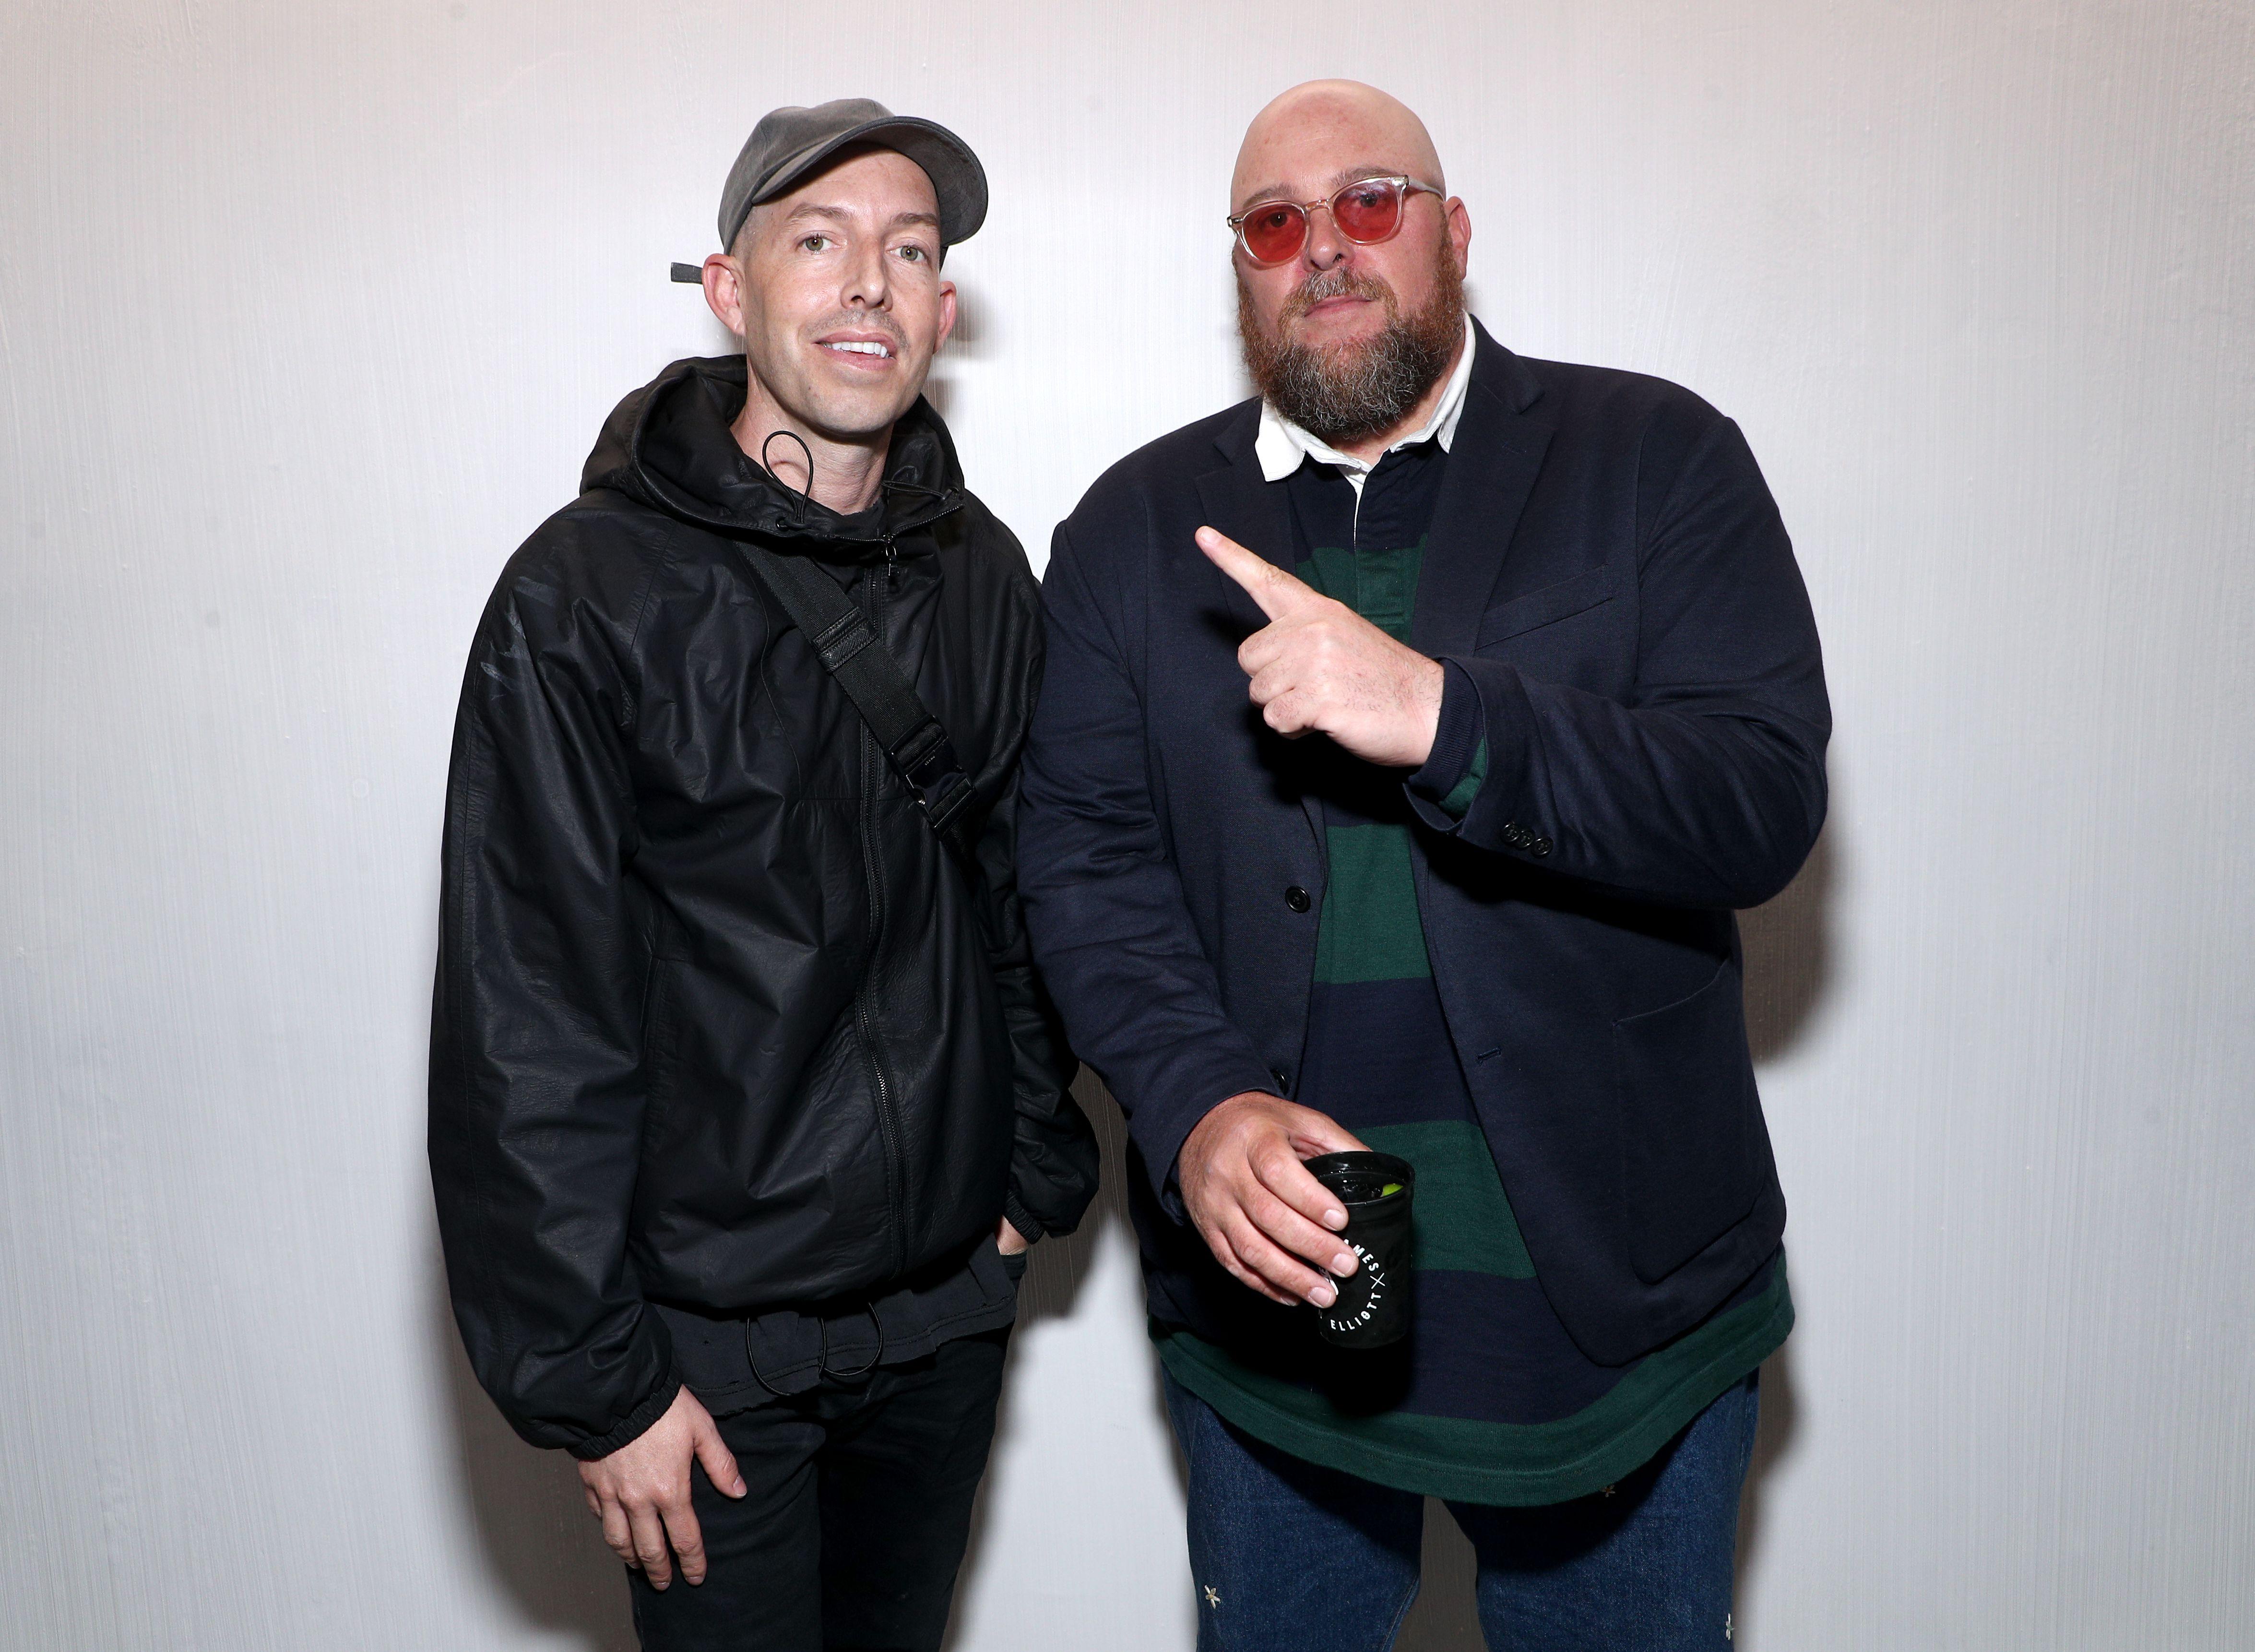 John Elliott and Jon BuscemiNike Lebron James x John Elliott Icon Celebration, Inside, Los Angeles, USA - 21 May 2019